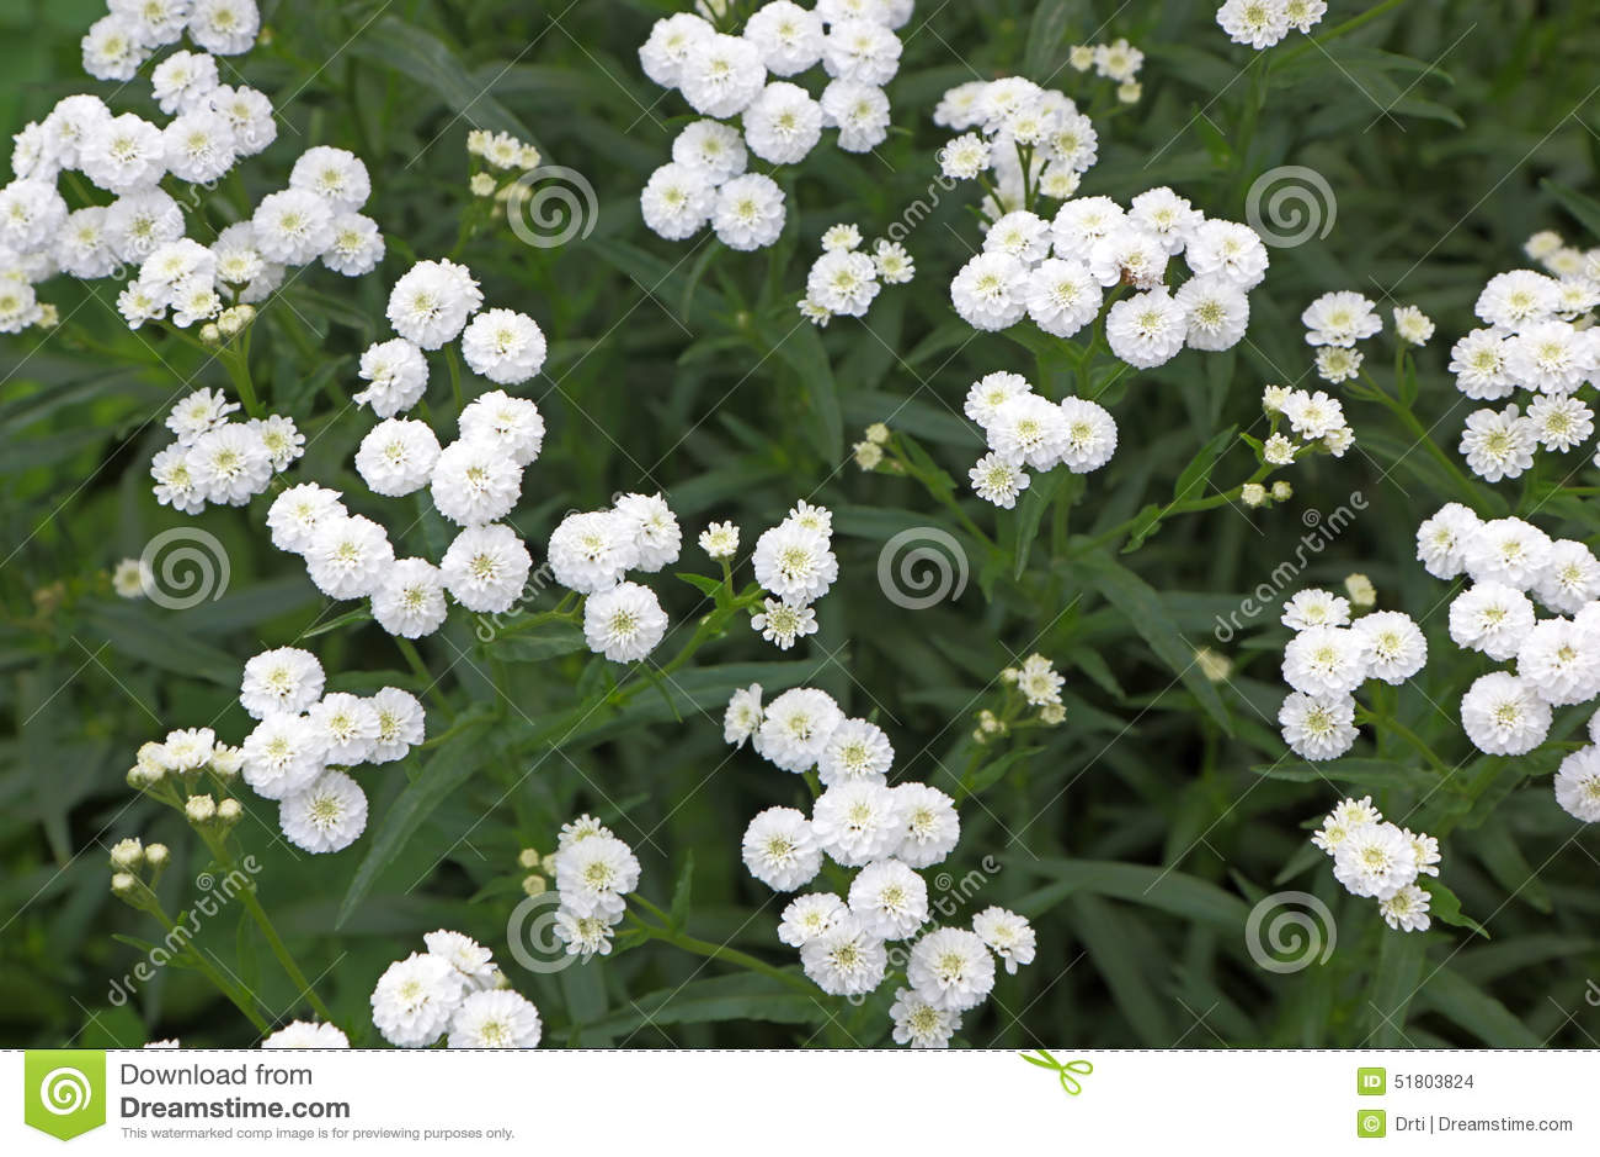 Small white garden flowers stock photo image of growth 51803824 small white garden flowers mightylinksfo